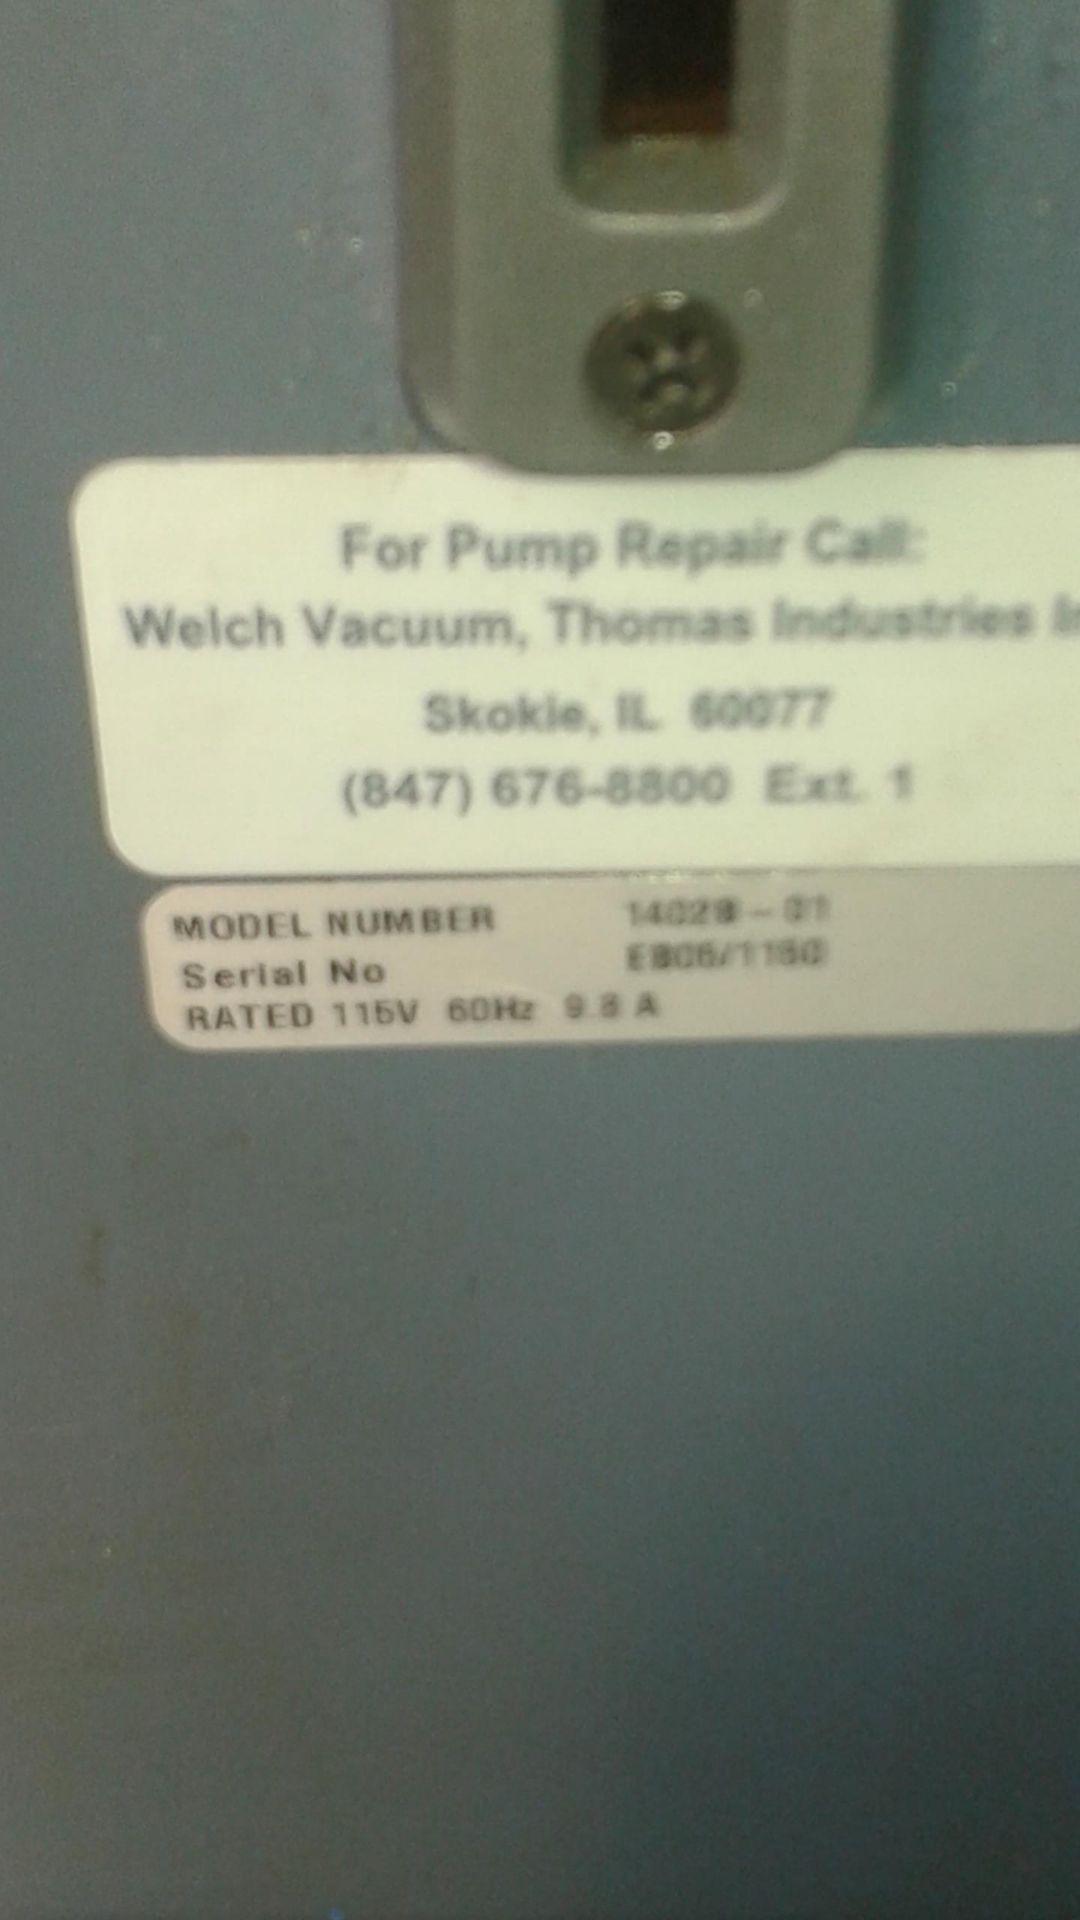 Welch Model 1402 Duo-Seal Vacuum Pump - LOCATION - LONDON, ONTARIO - Image 3 of 3